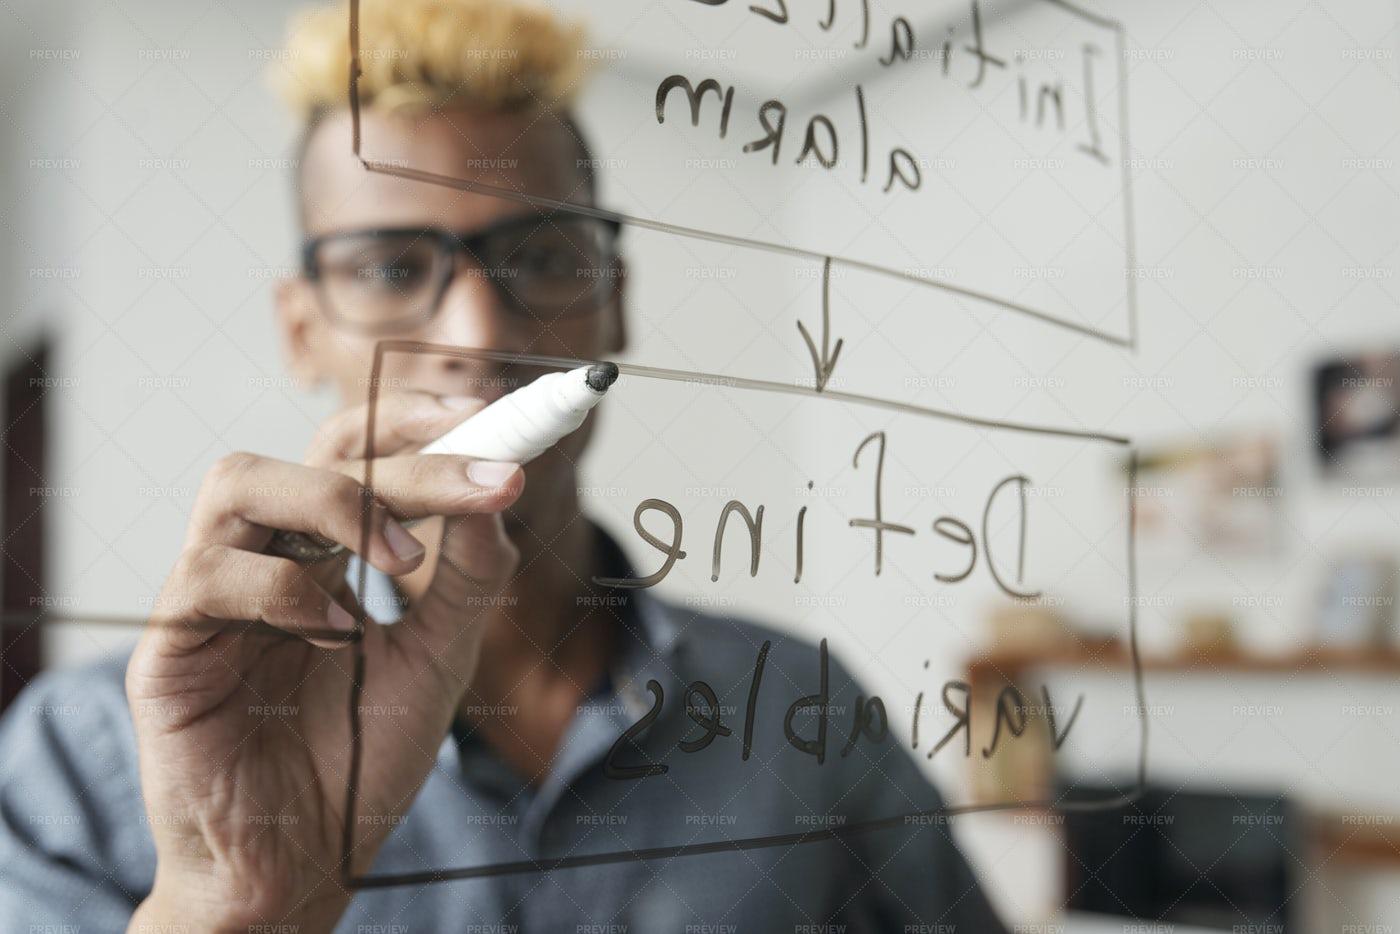 Programer Drawing Block Scheme: Stock Photos